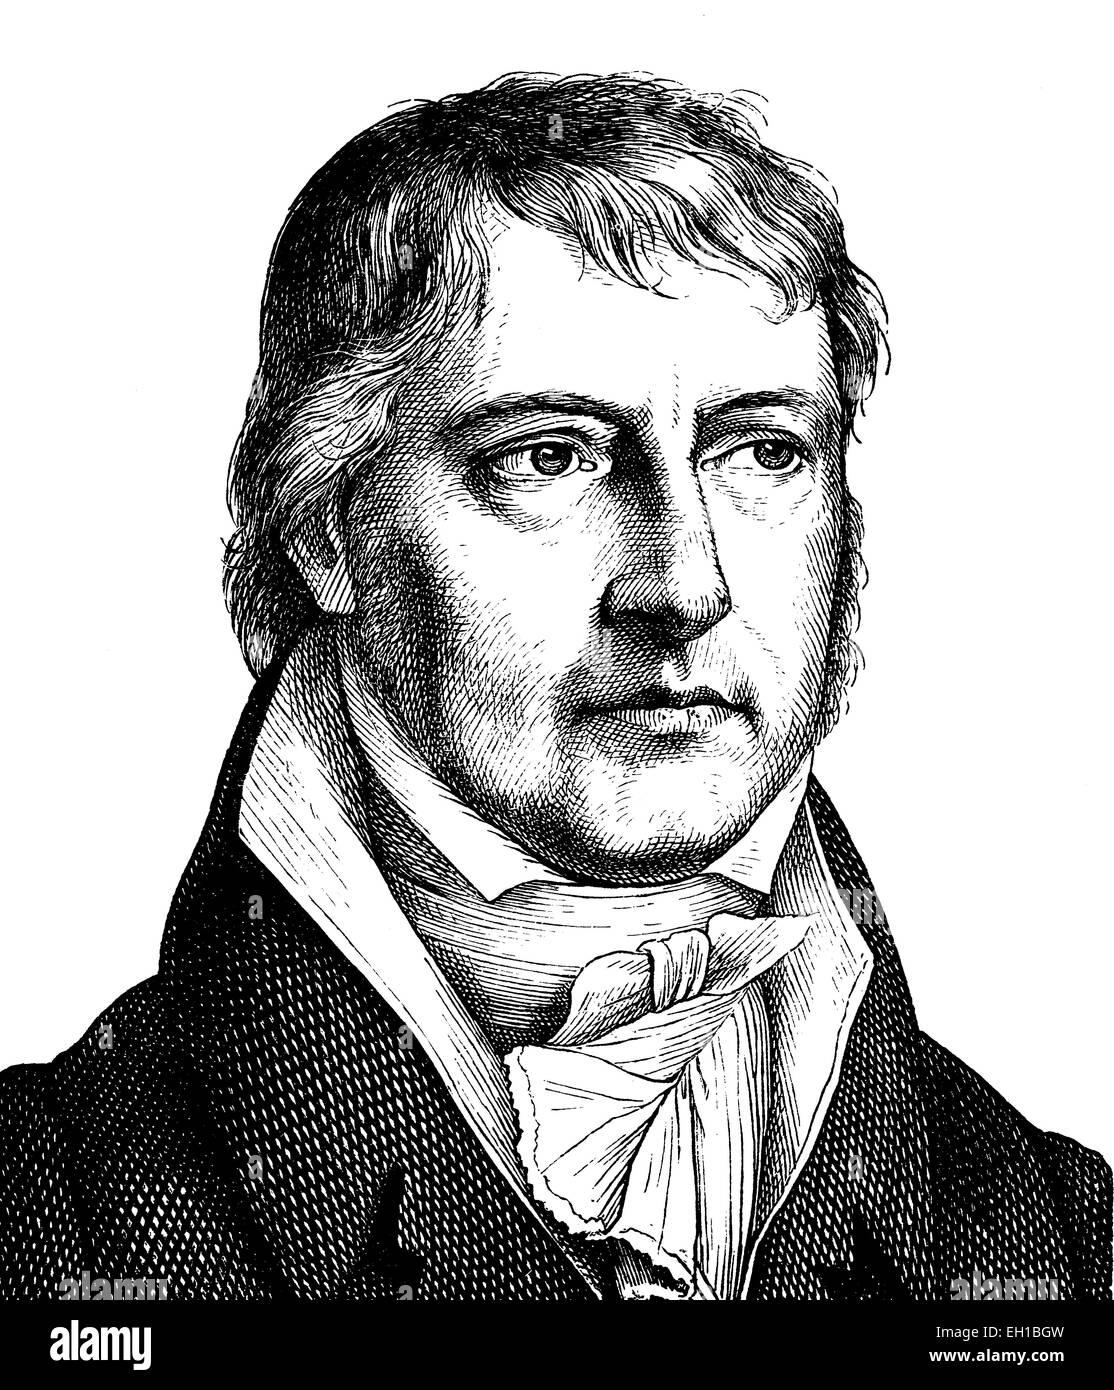 Digital improved image of Georg Wilhelm Friedrich Hegel, 1770 - 1831, German philosopher, portrait, historical illustration, Stock Photo